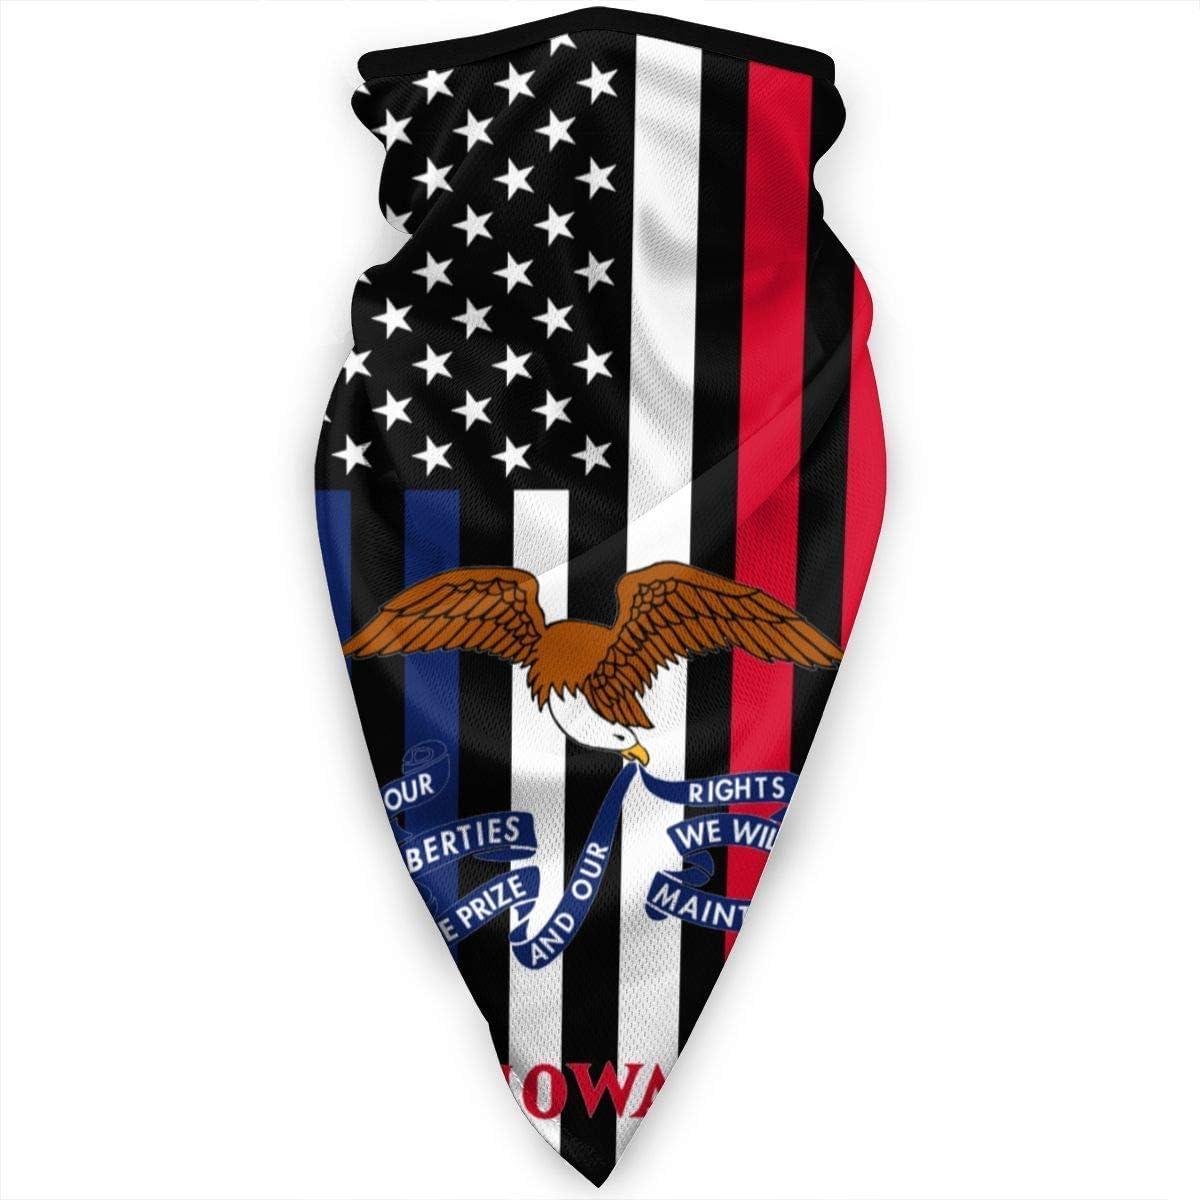 Yuanmeiju Iowa State Flag USA Face Mask Neck Gaiters Bandana Scarf BalaclavaMultifunctional Headwear for Outdoor Sports